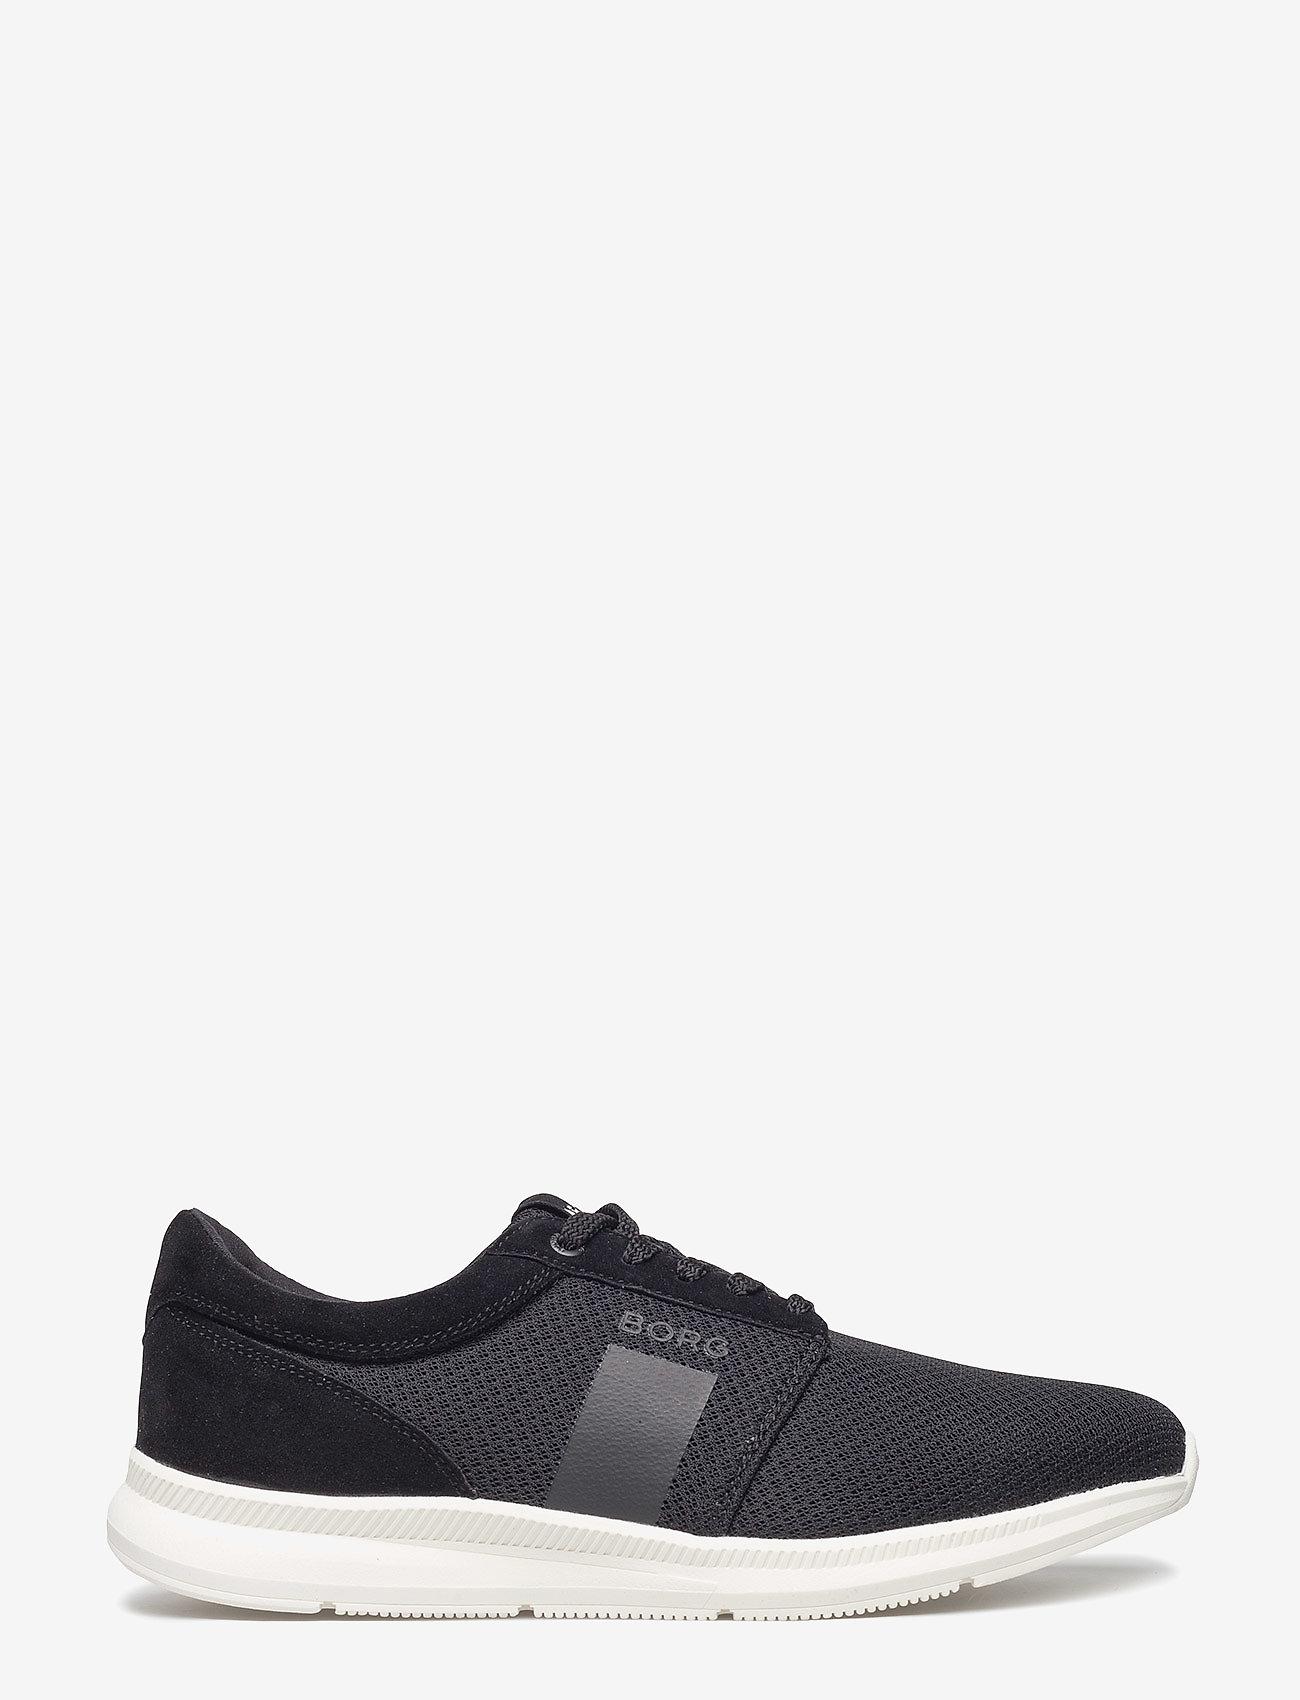 Björn Borg - R500 Low Msh M - laag sneakers - black - 1